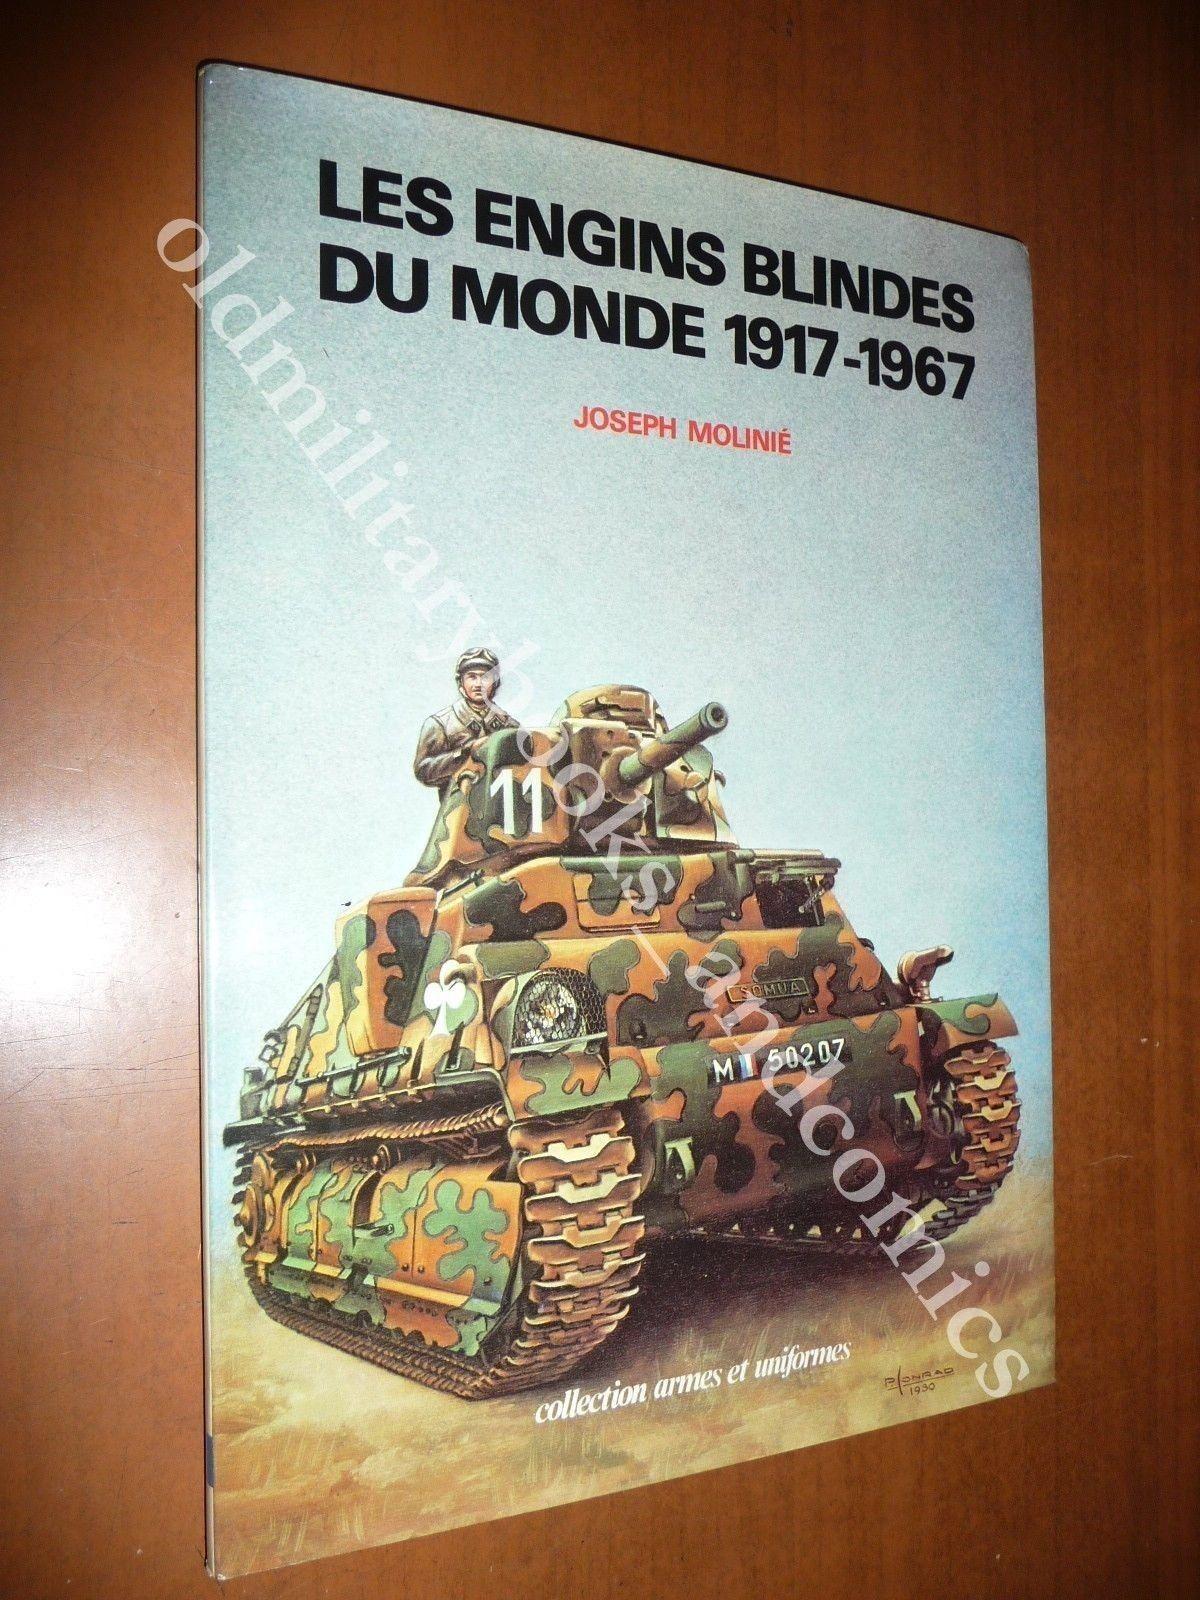 LES ENGINS BLINDES DU MONDE 1917-1967 JOSEPH MOLINIE 1981 CHARS TANK CARRI